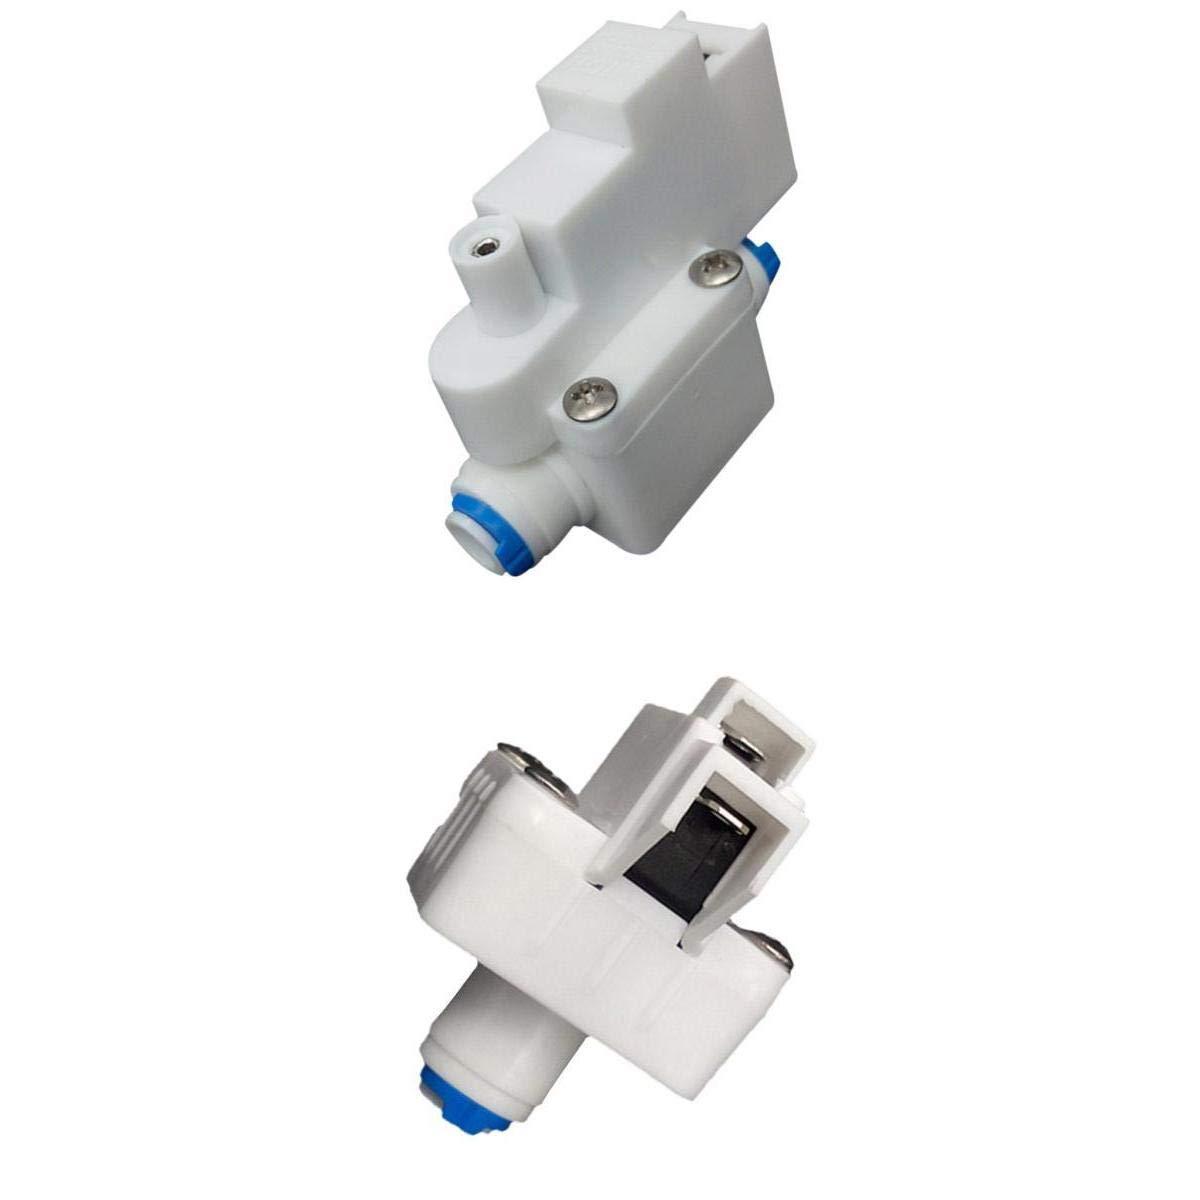 shamjina 2pcs High Voltage Water Purifier Switch Parts Valve Regulator